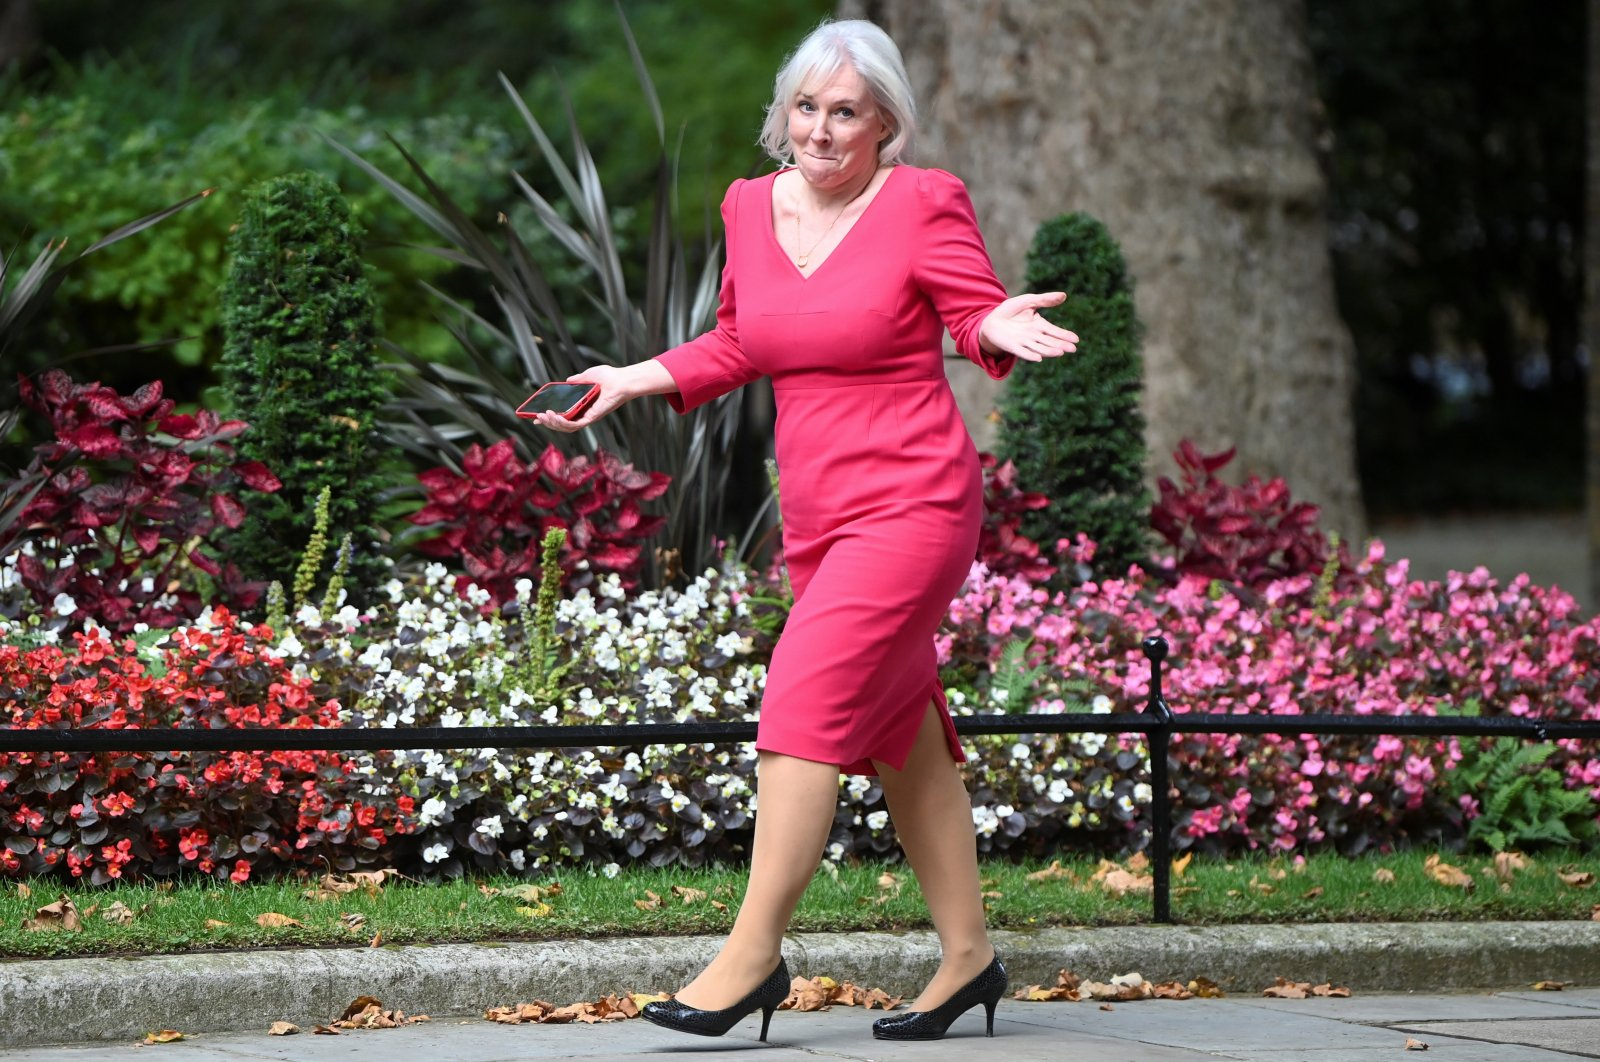 The U.K.'s Culture Secretary Nadine Dorries walks outside Downing Street in London, U.K., Sept. 15, 2021. (Reuters Photo)